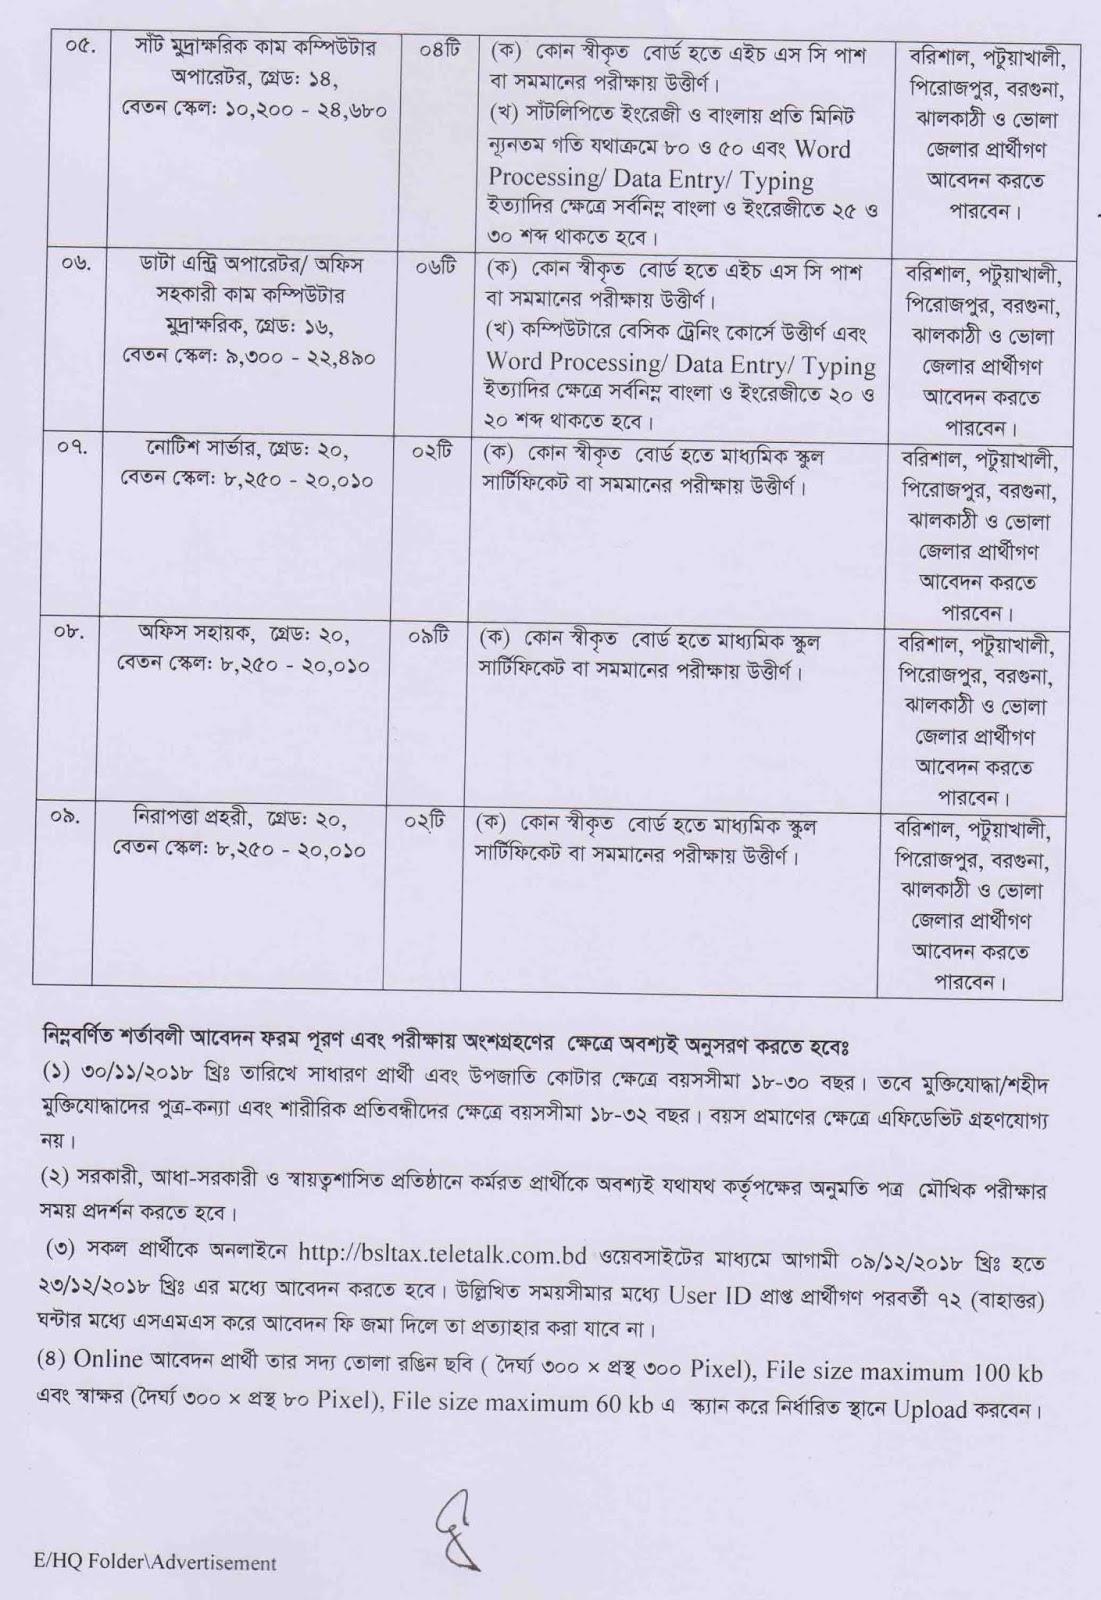 Tax Commissioner, Barisal Job Circular 2018